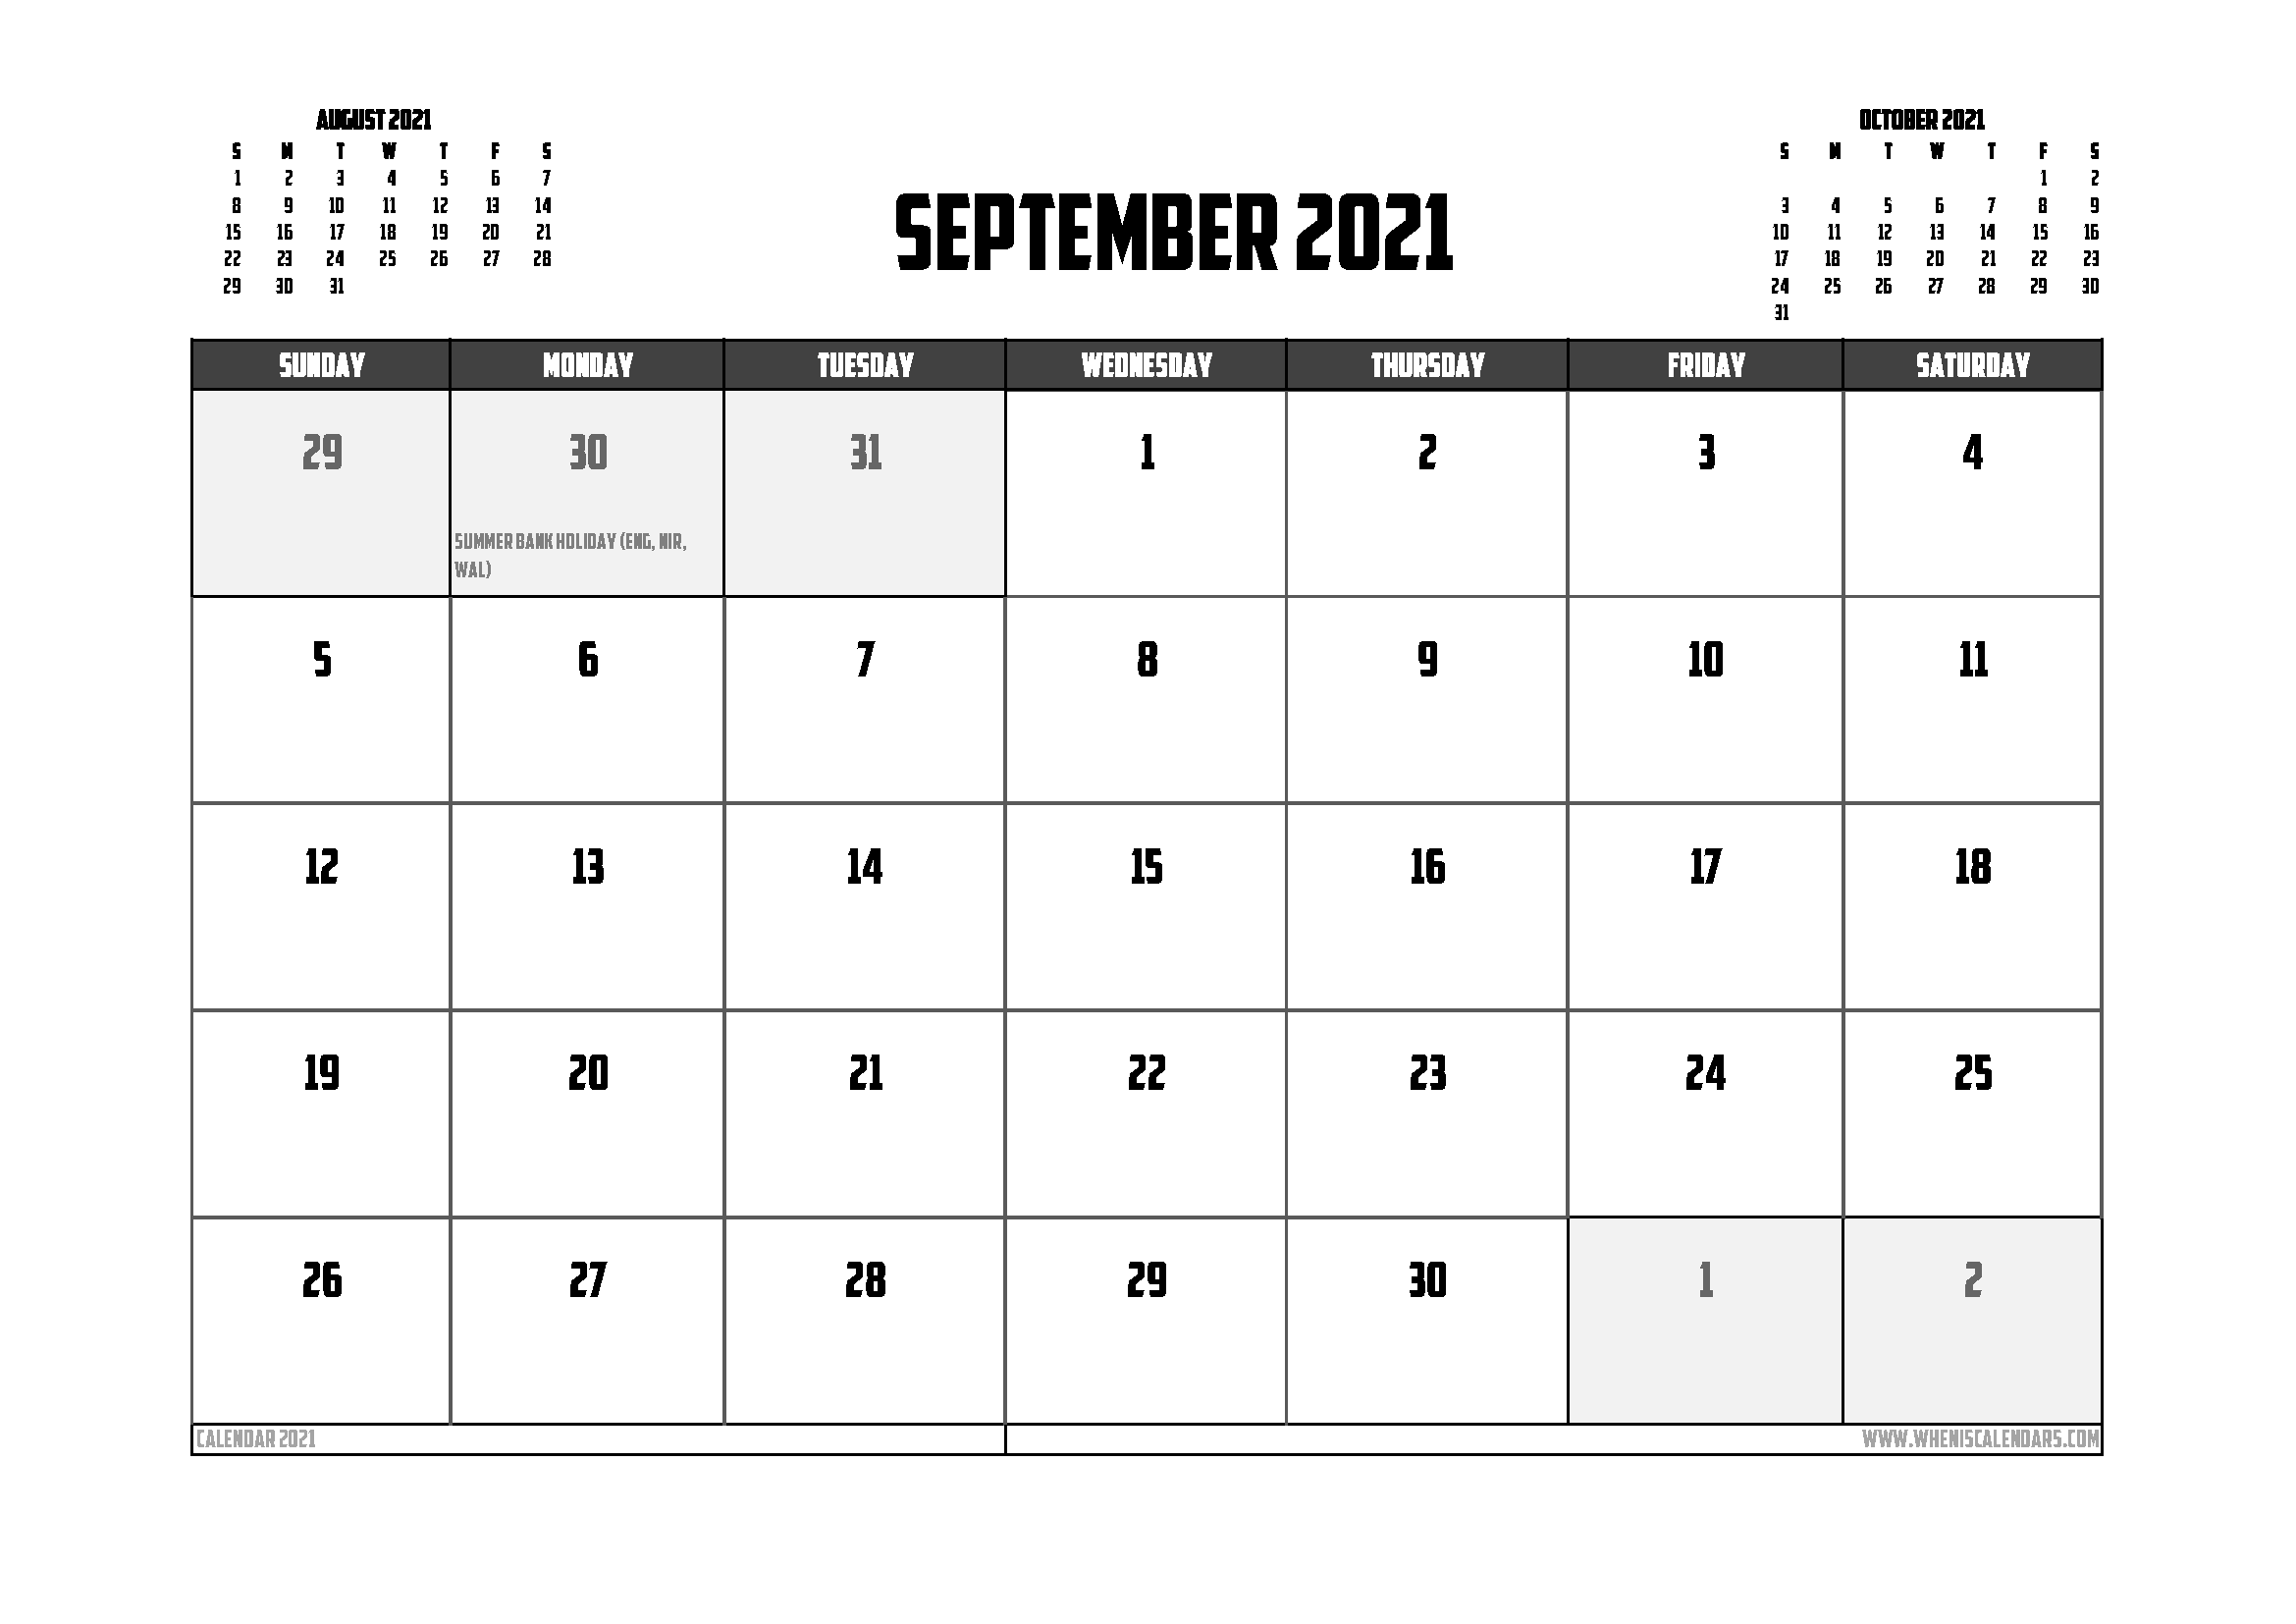 Utd Fall 2022 Calendar.2022 Calendar September 2021 Calendar Uk